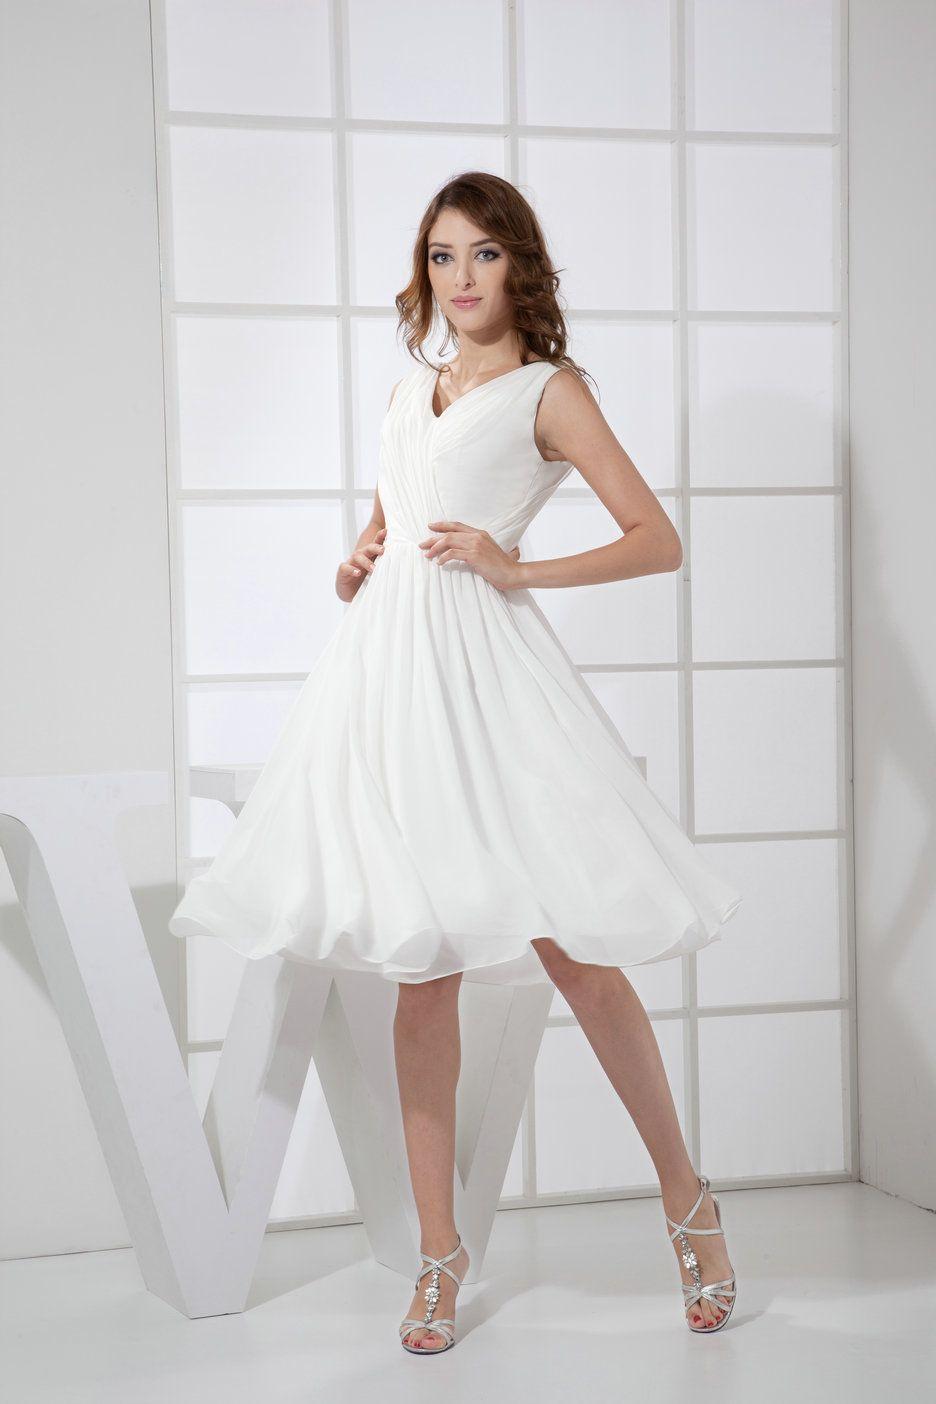 Short Ivory White Graduation Dress With Lace Back White Dresses Graduation Dresses Short Graduation Dresses [ 1666 x 1000 Pixel ]